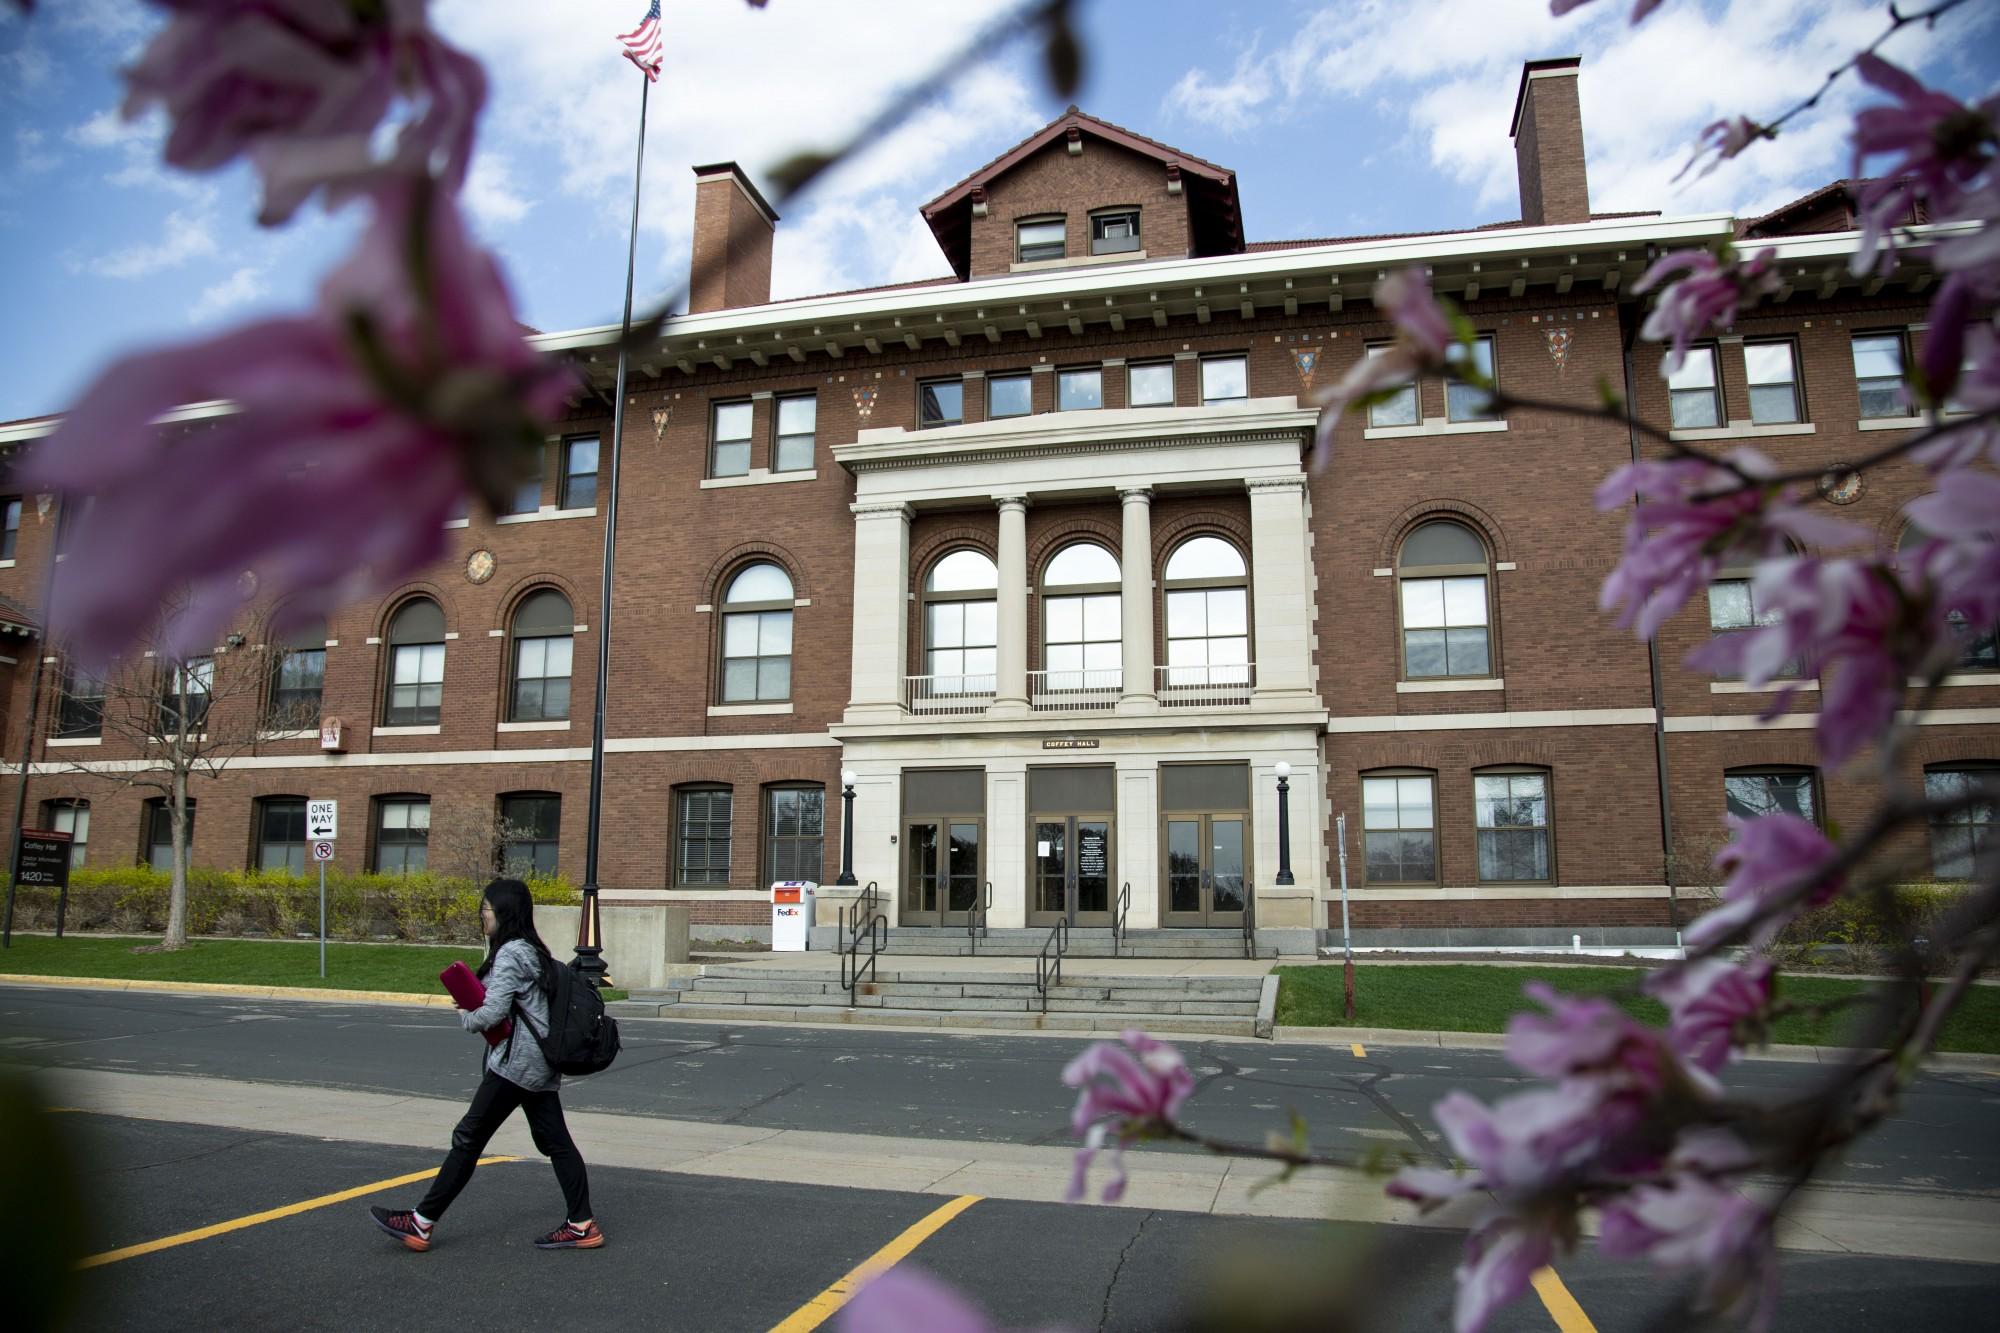 4:40 p.m. A student walks past Coffey Hall.